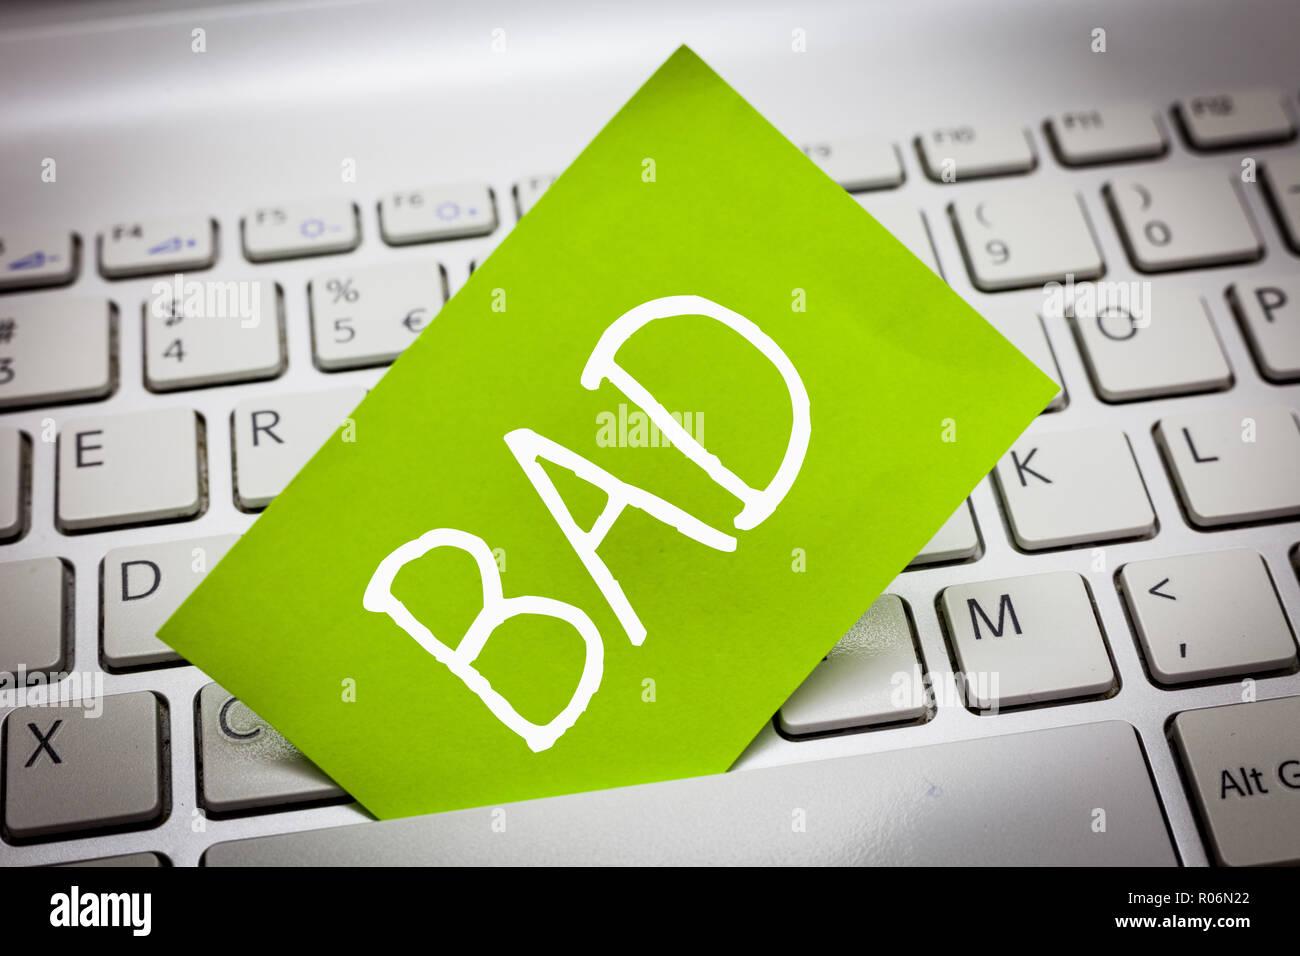 bad negotiation stock photos  u0026 bad negotiation stock